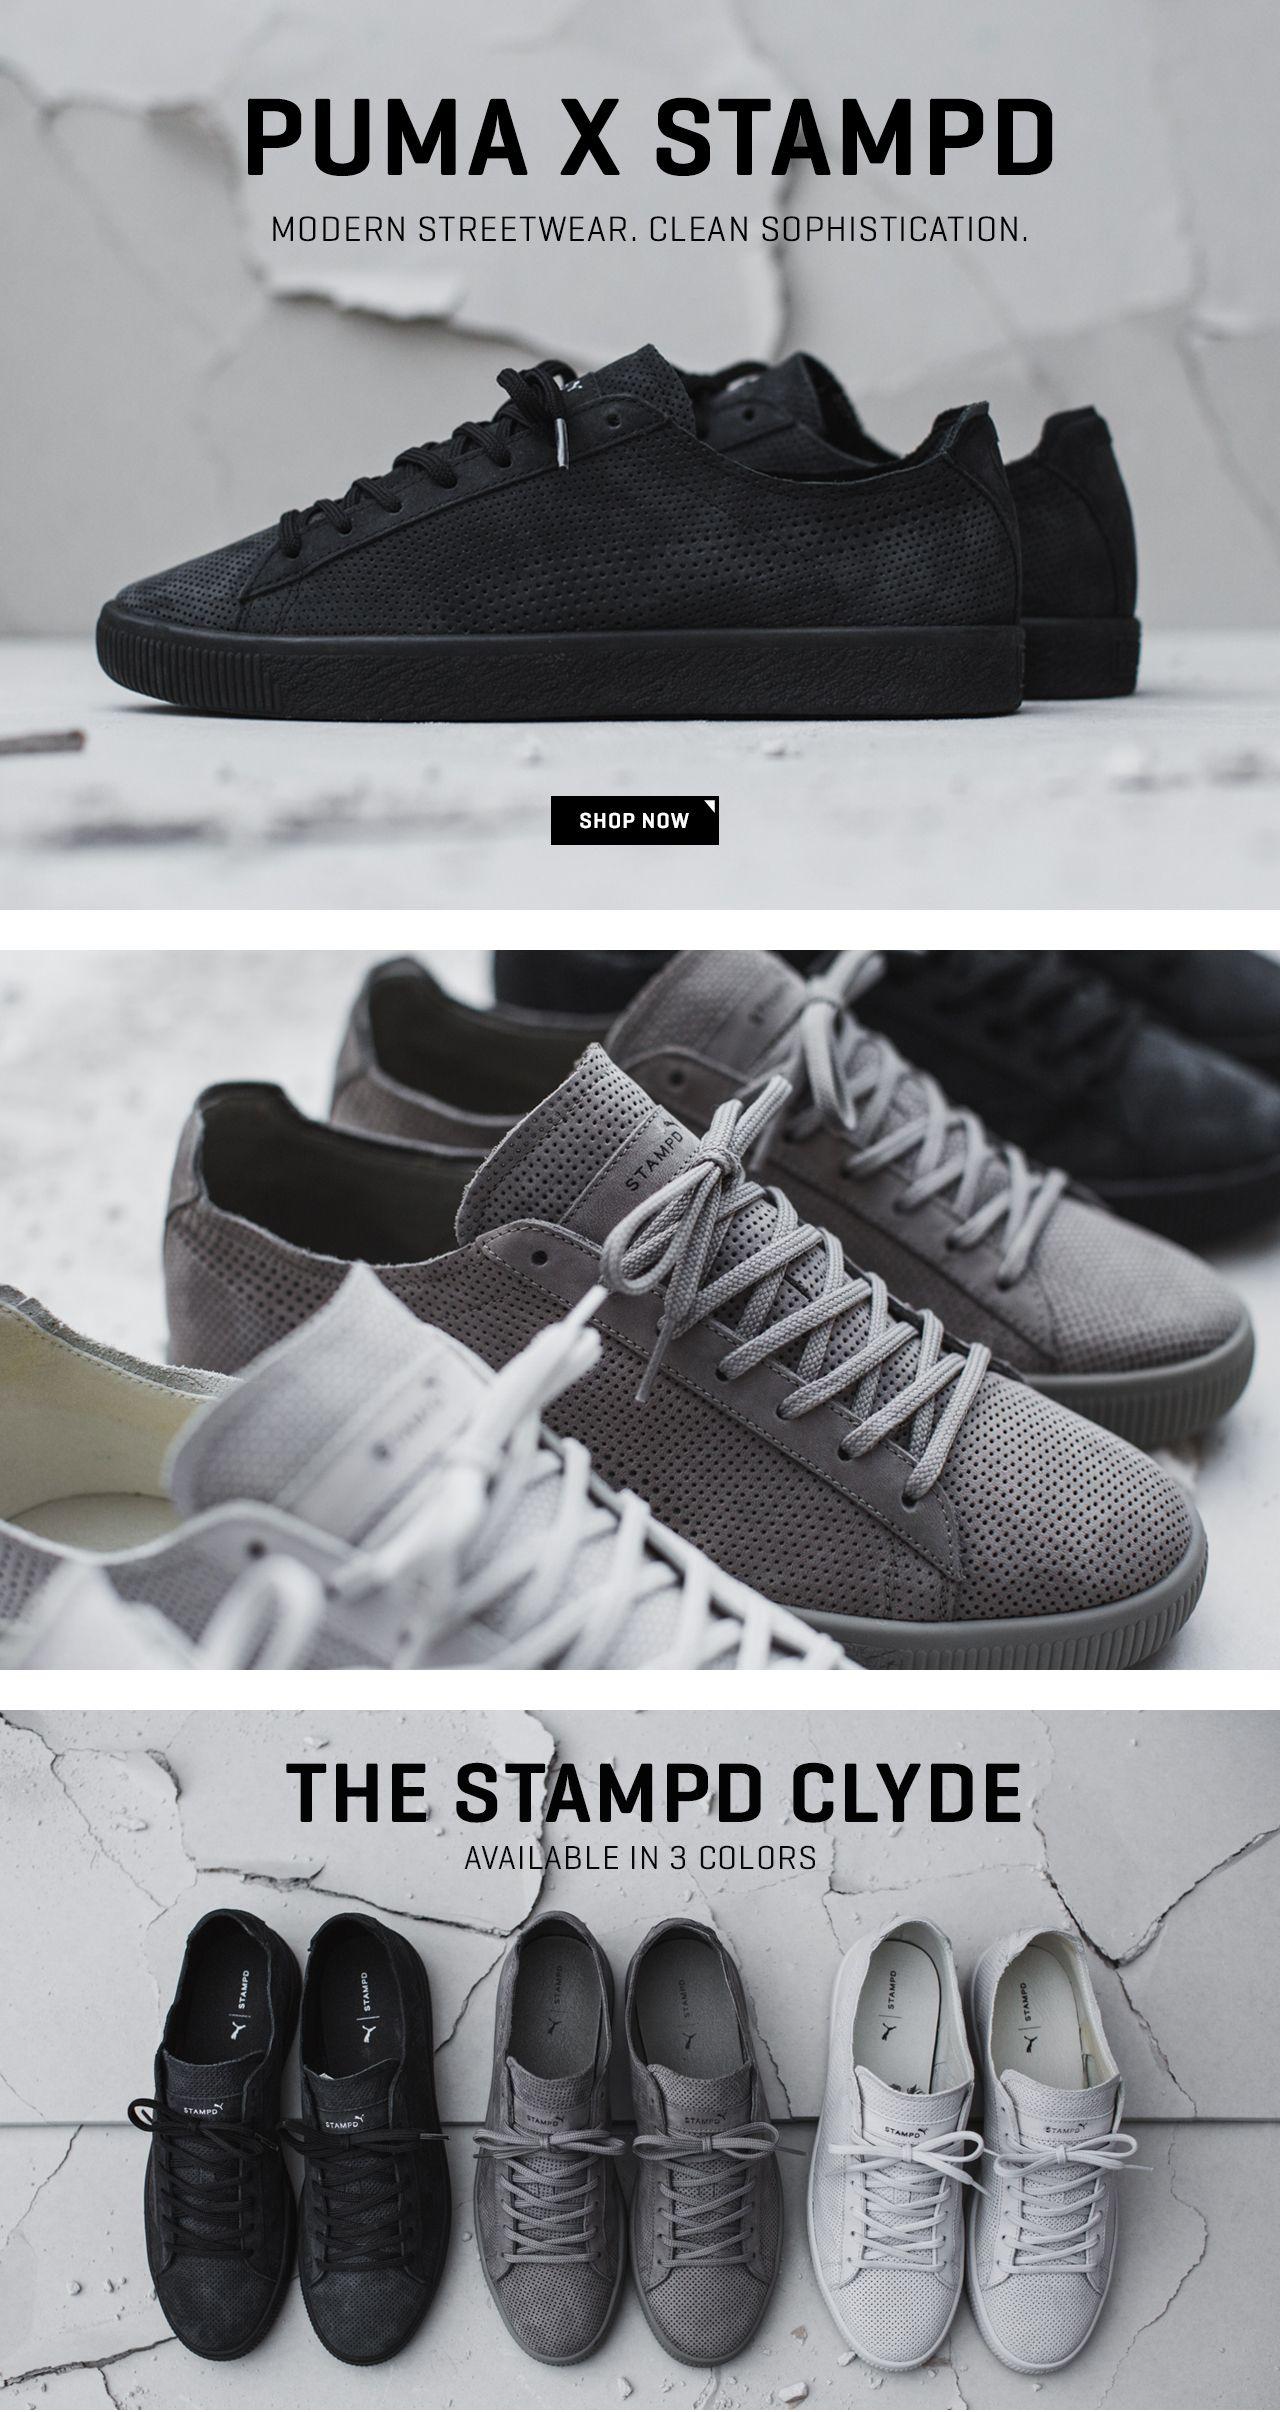 17ss_btl_ecom_select_stampd-clyde_email_pna